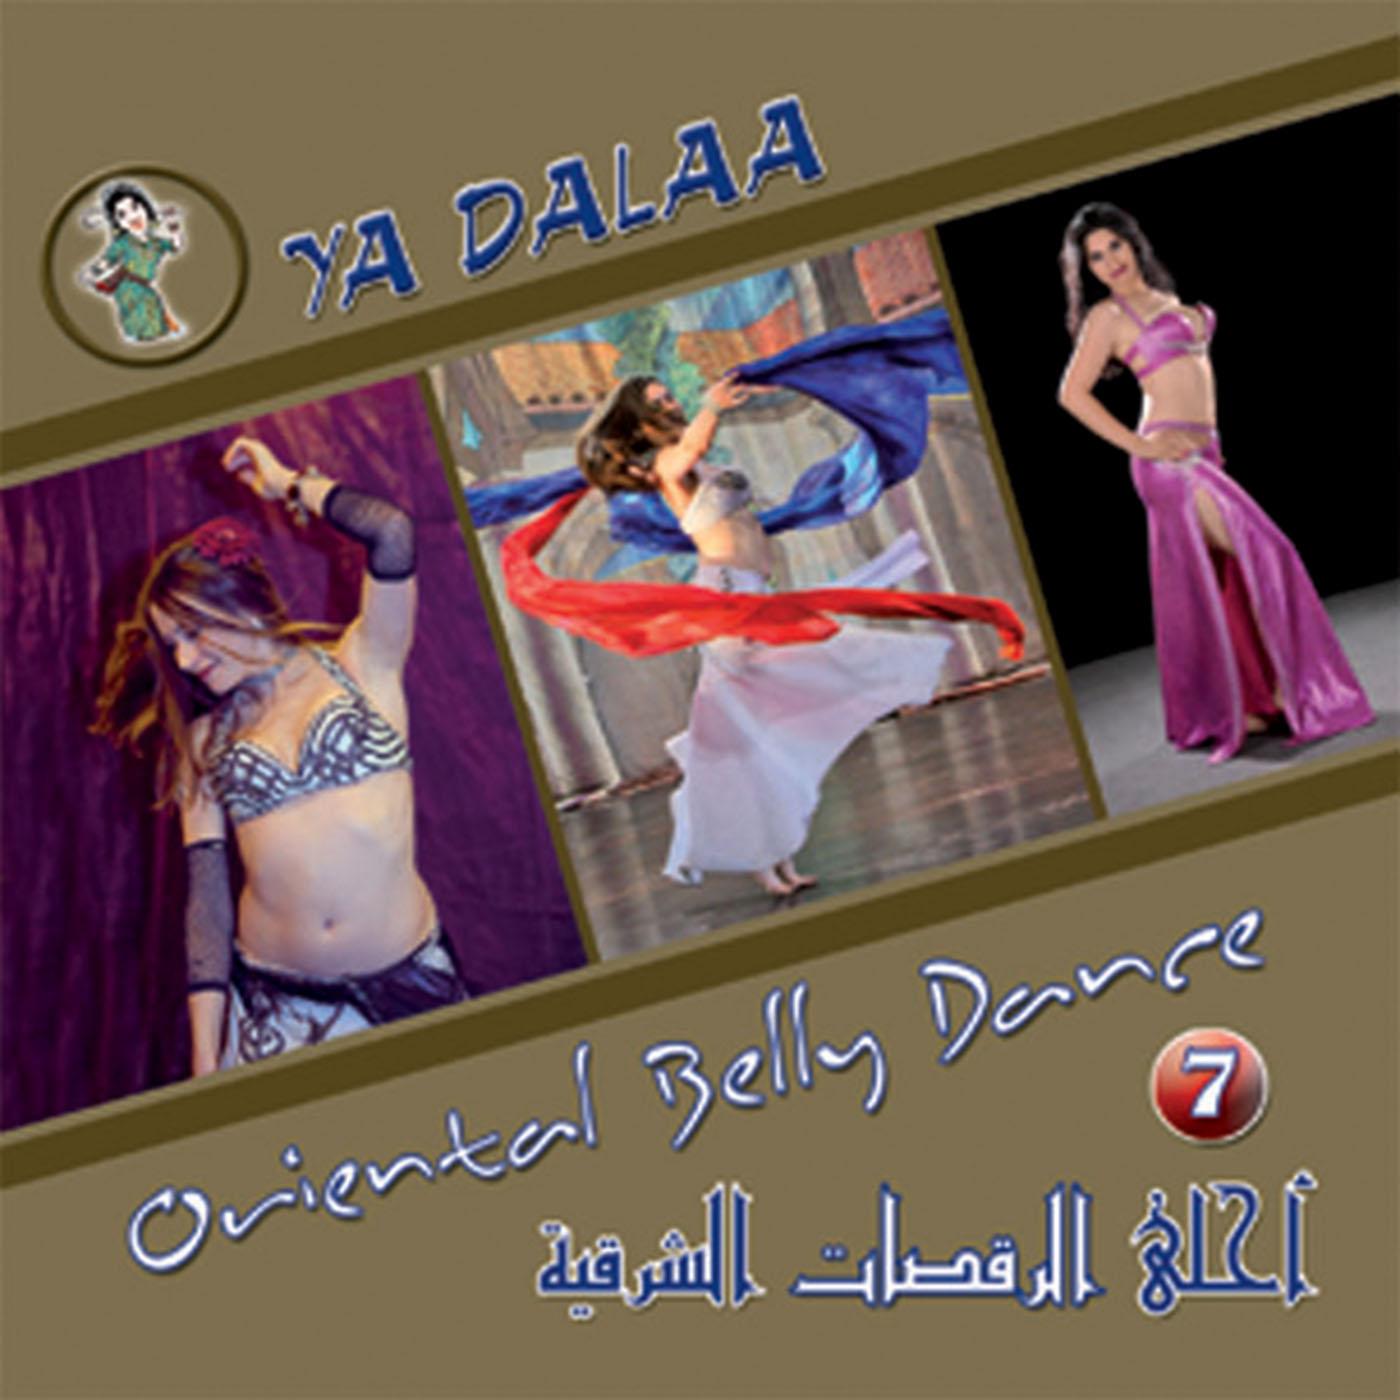 YA DALAA (Best Oriental Belly Dance Vol 7 )/  VARIOUS ARTISTS    BUY IT